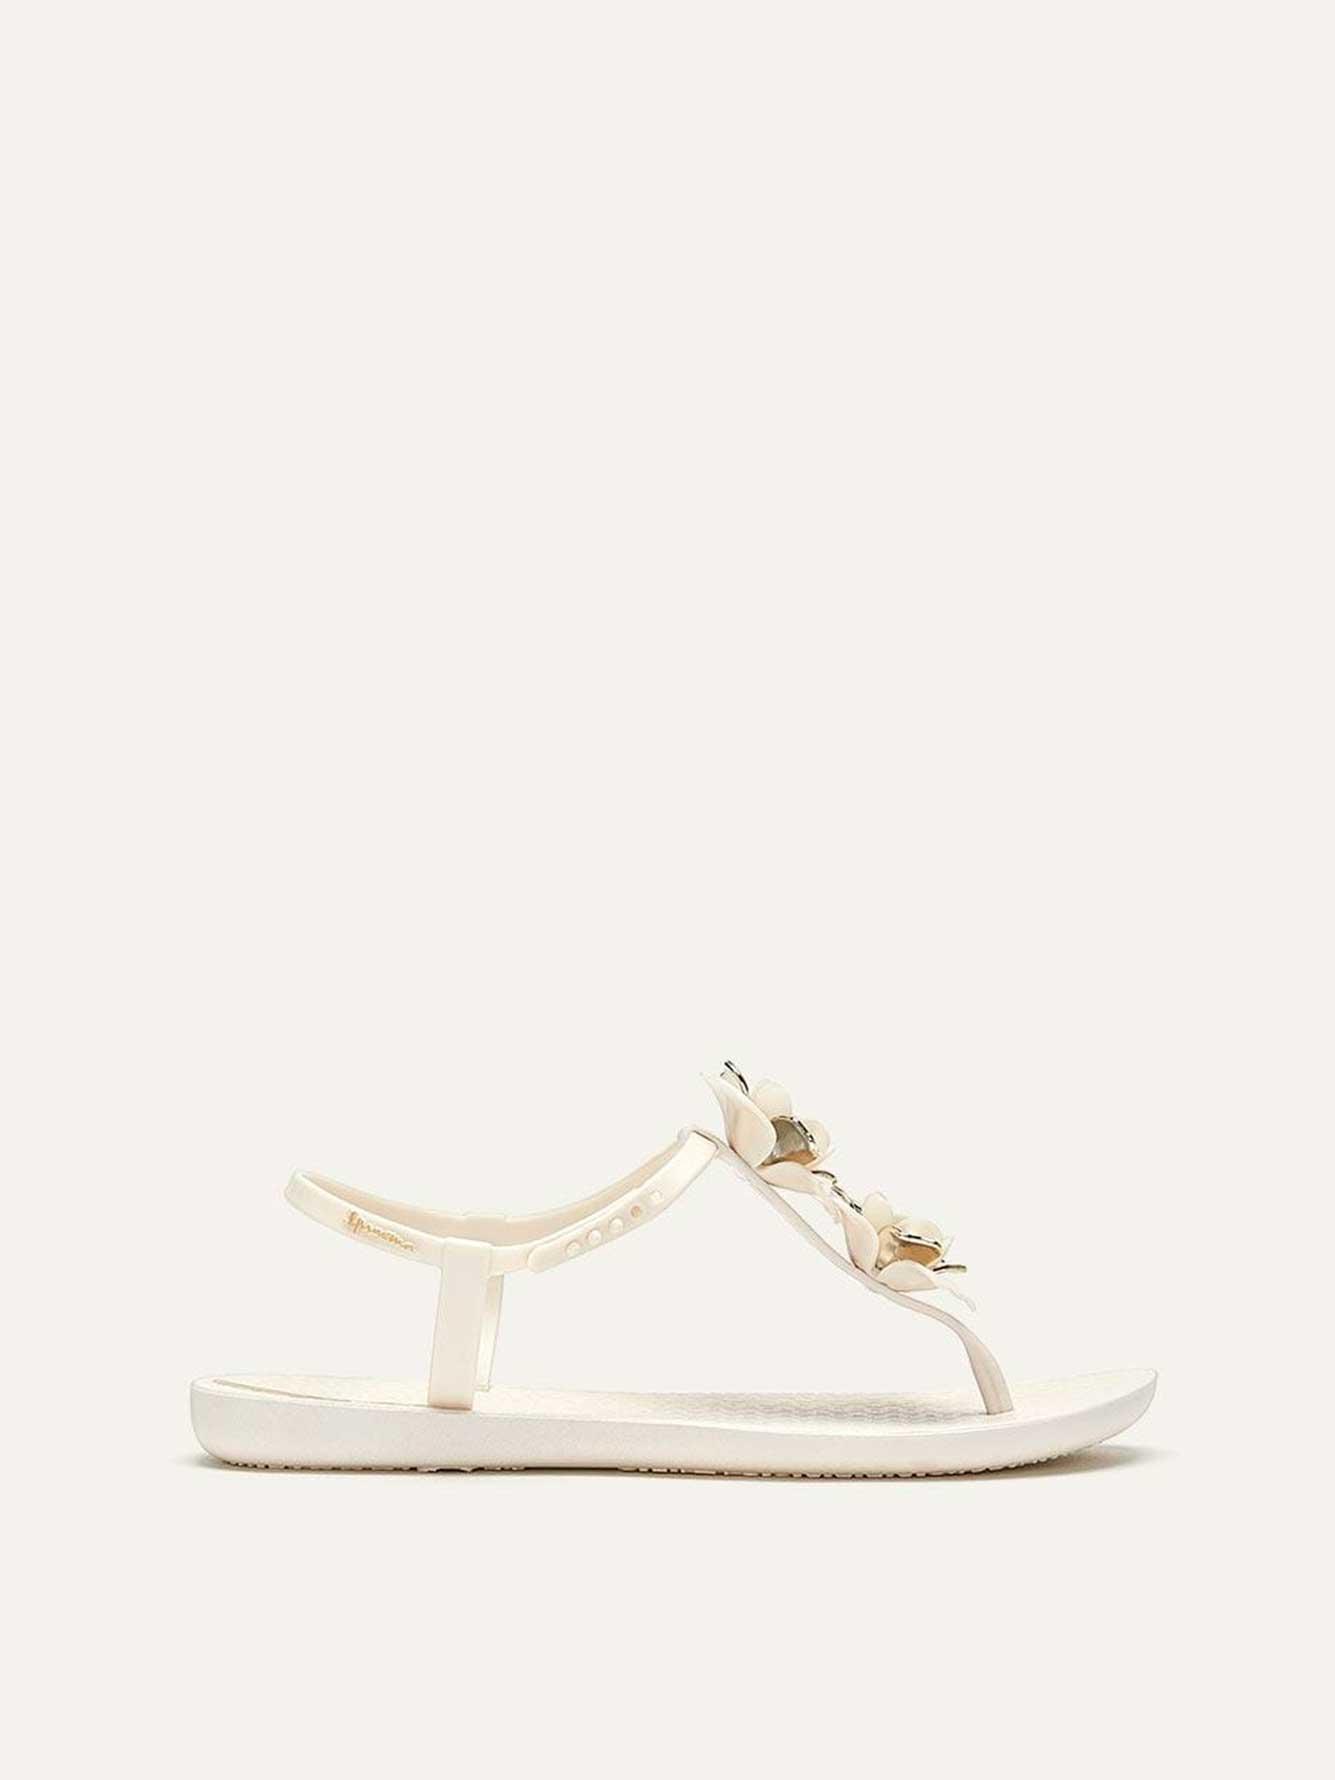 Sling Back Adjustable Sandals - Ipanema